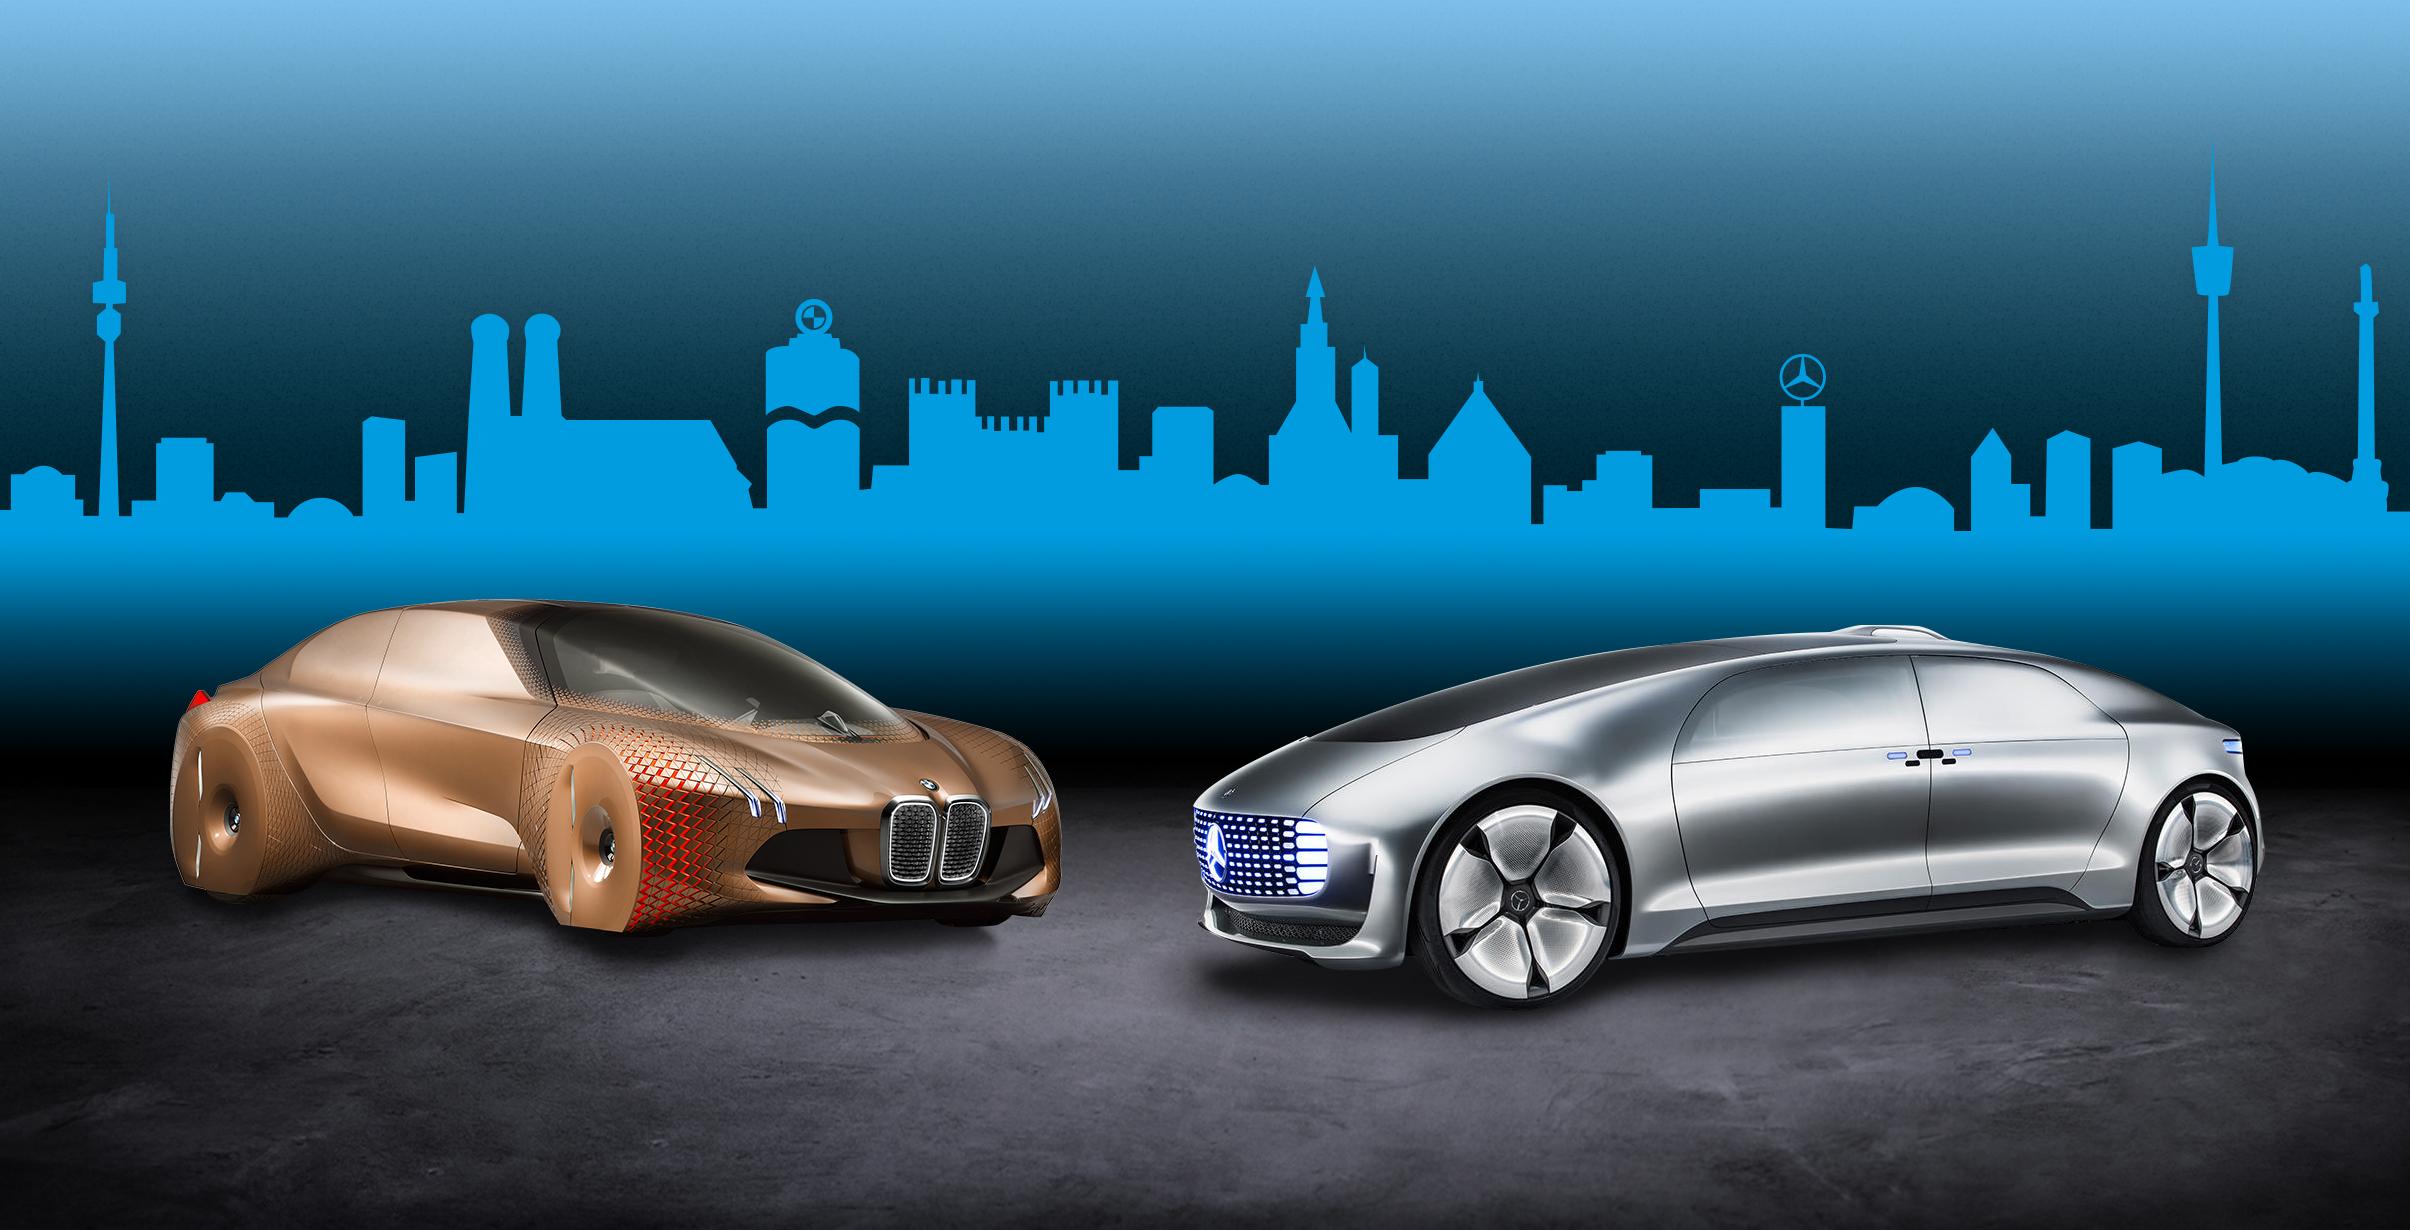 BMW and Daimler Form Partnership to Bring Autonomous Vehicle